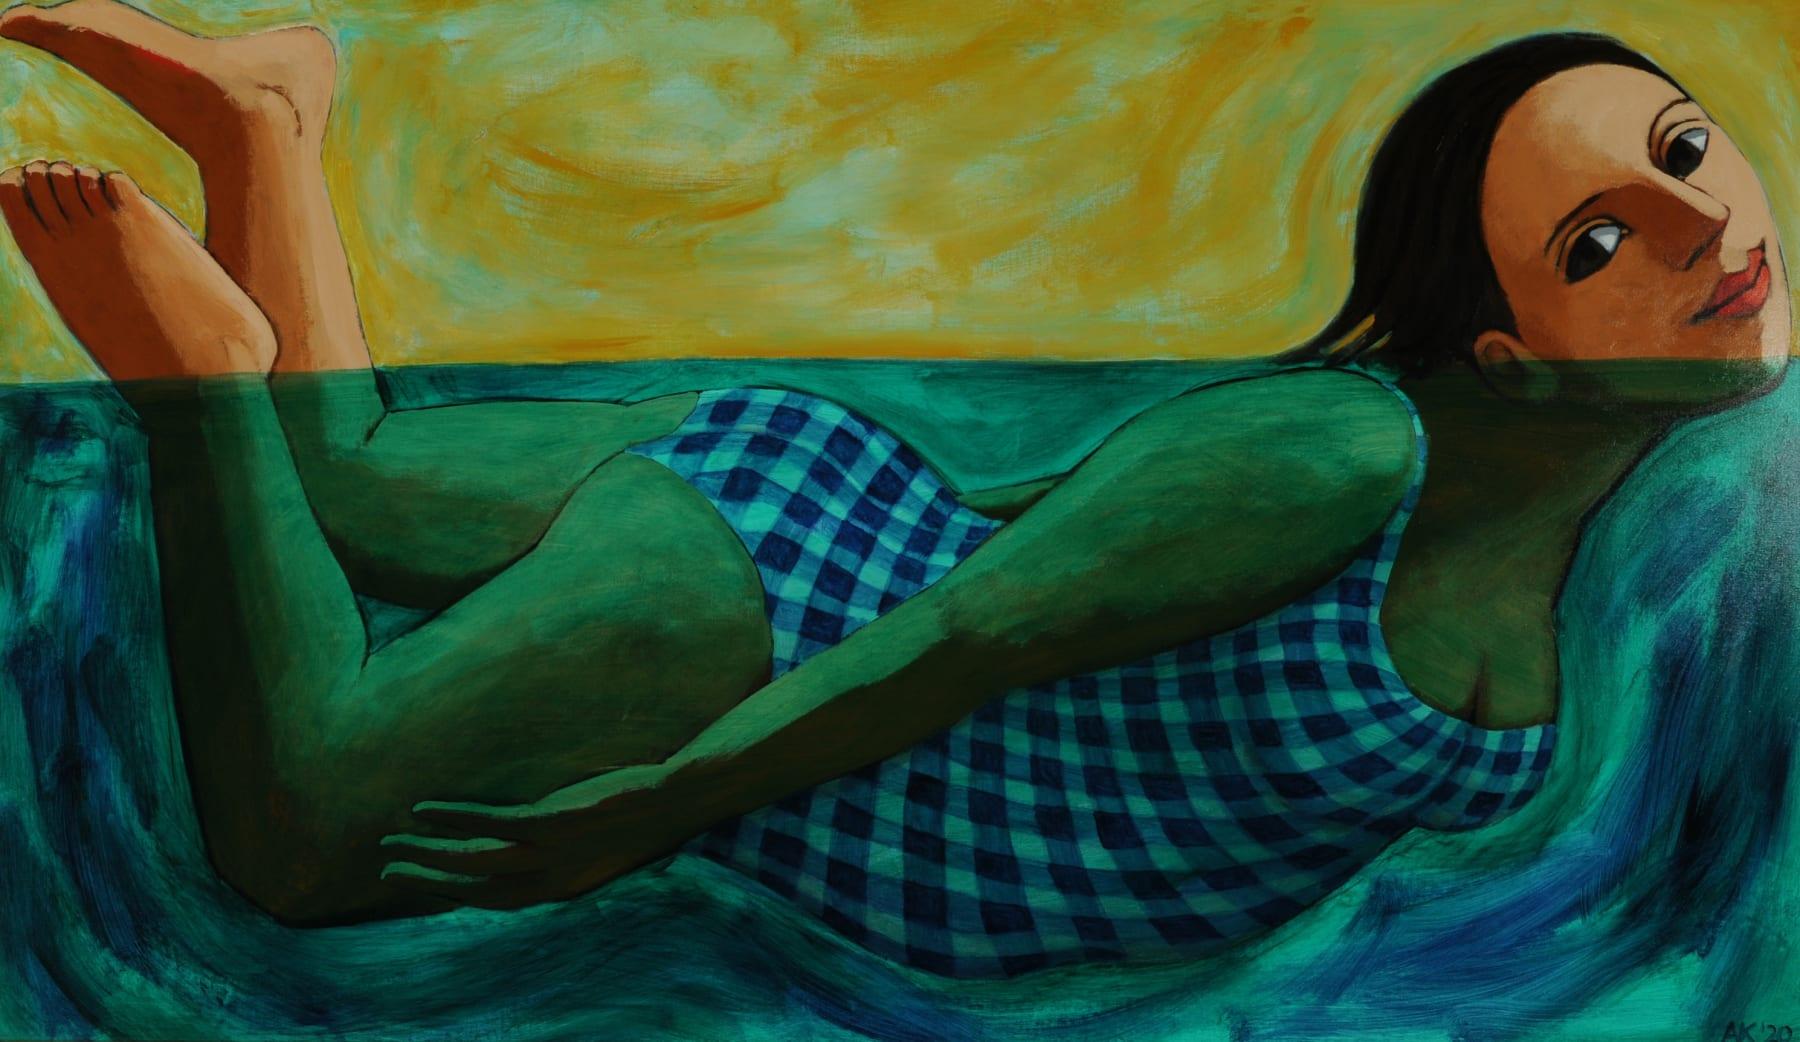 Anita Klein, The Beautiful Water, 2020